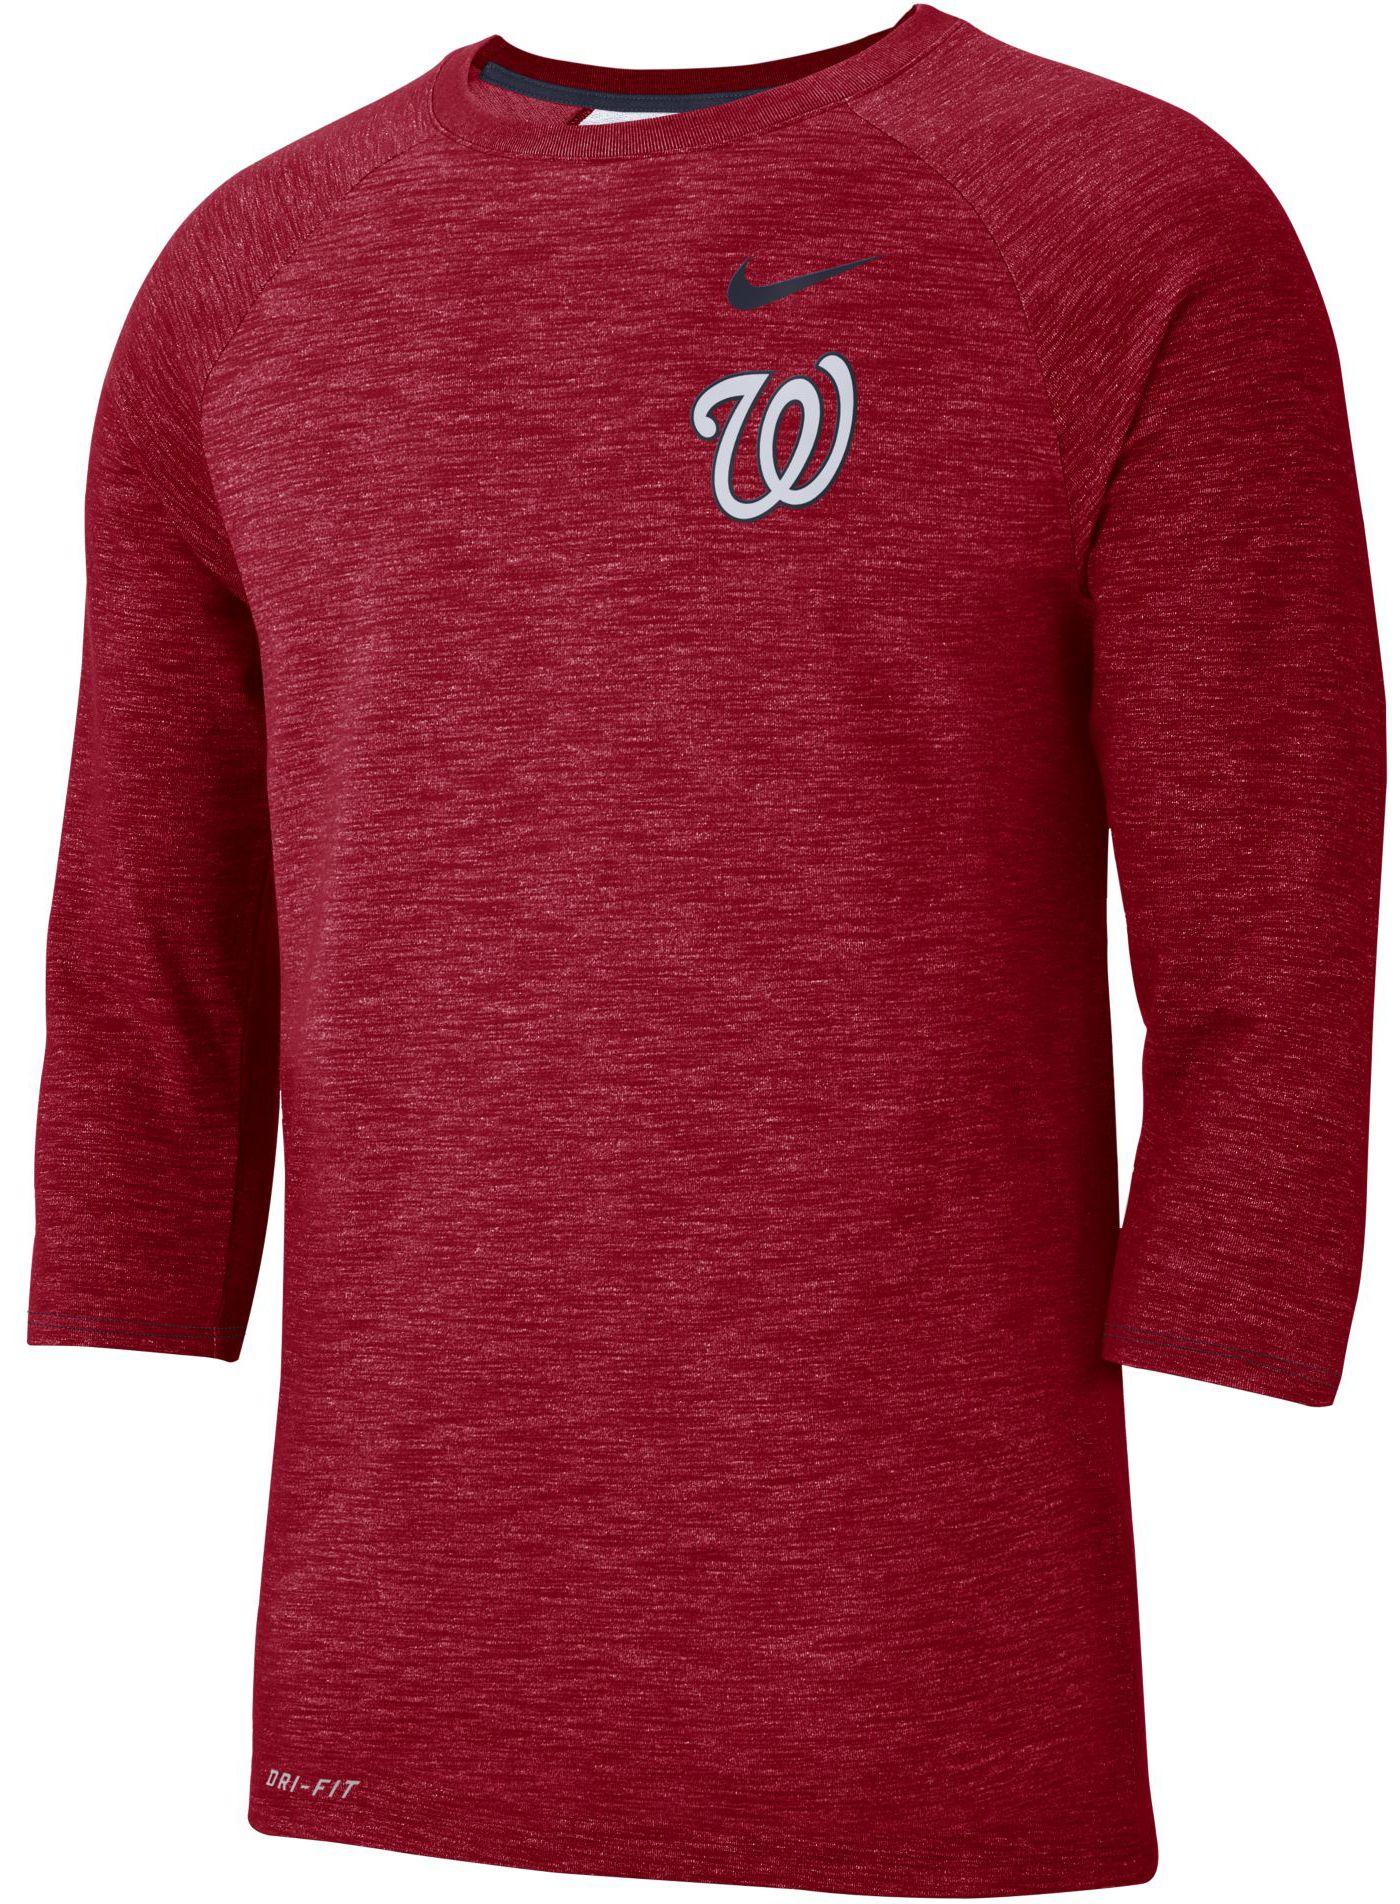 Nike Men's Washington Nationals Dri-FIT Slub Three-Quarter Sleeve Shirt